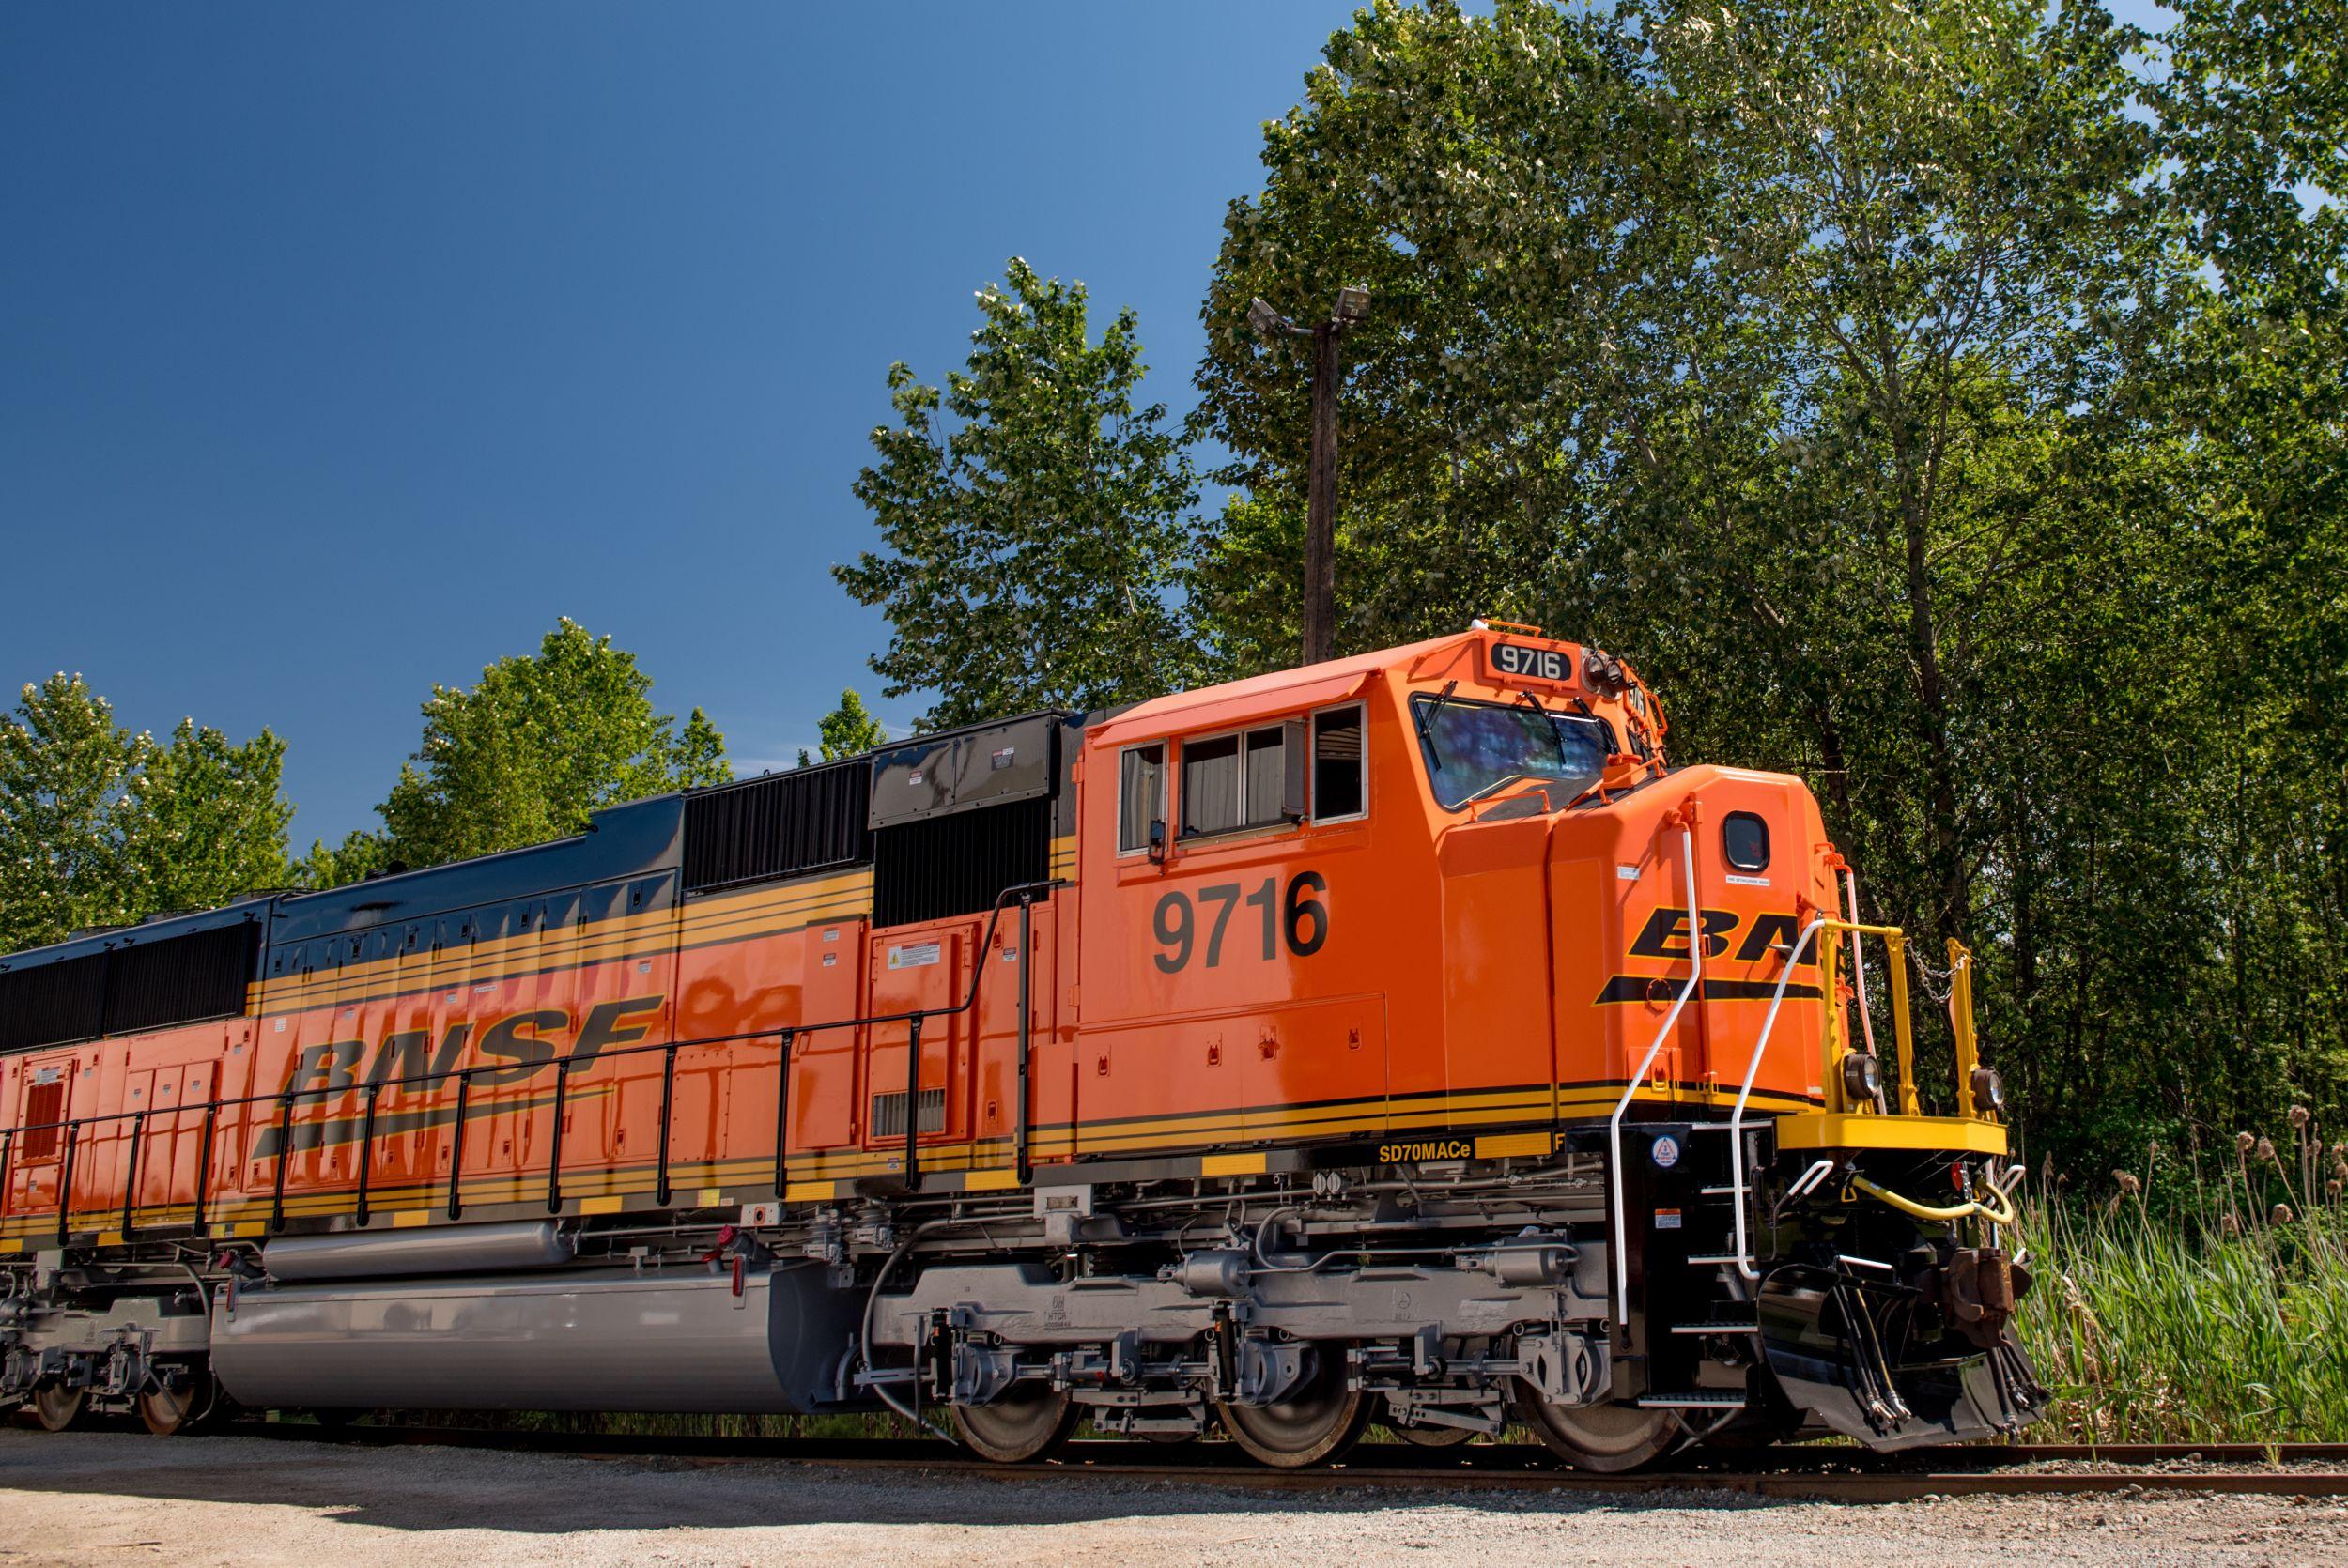 EMD® SD70MACe Repower Locomotive